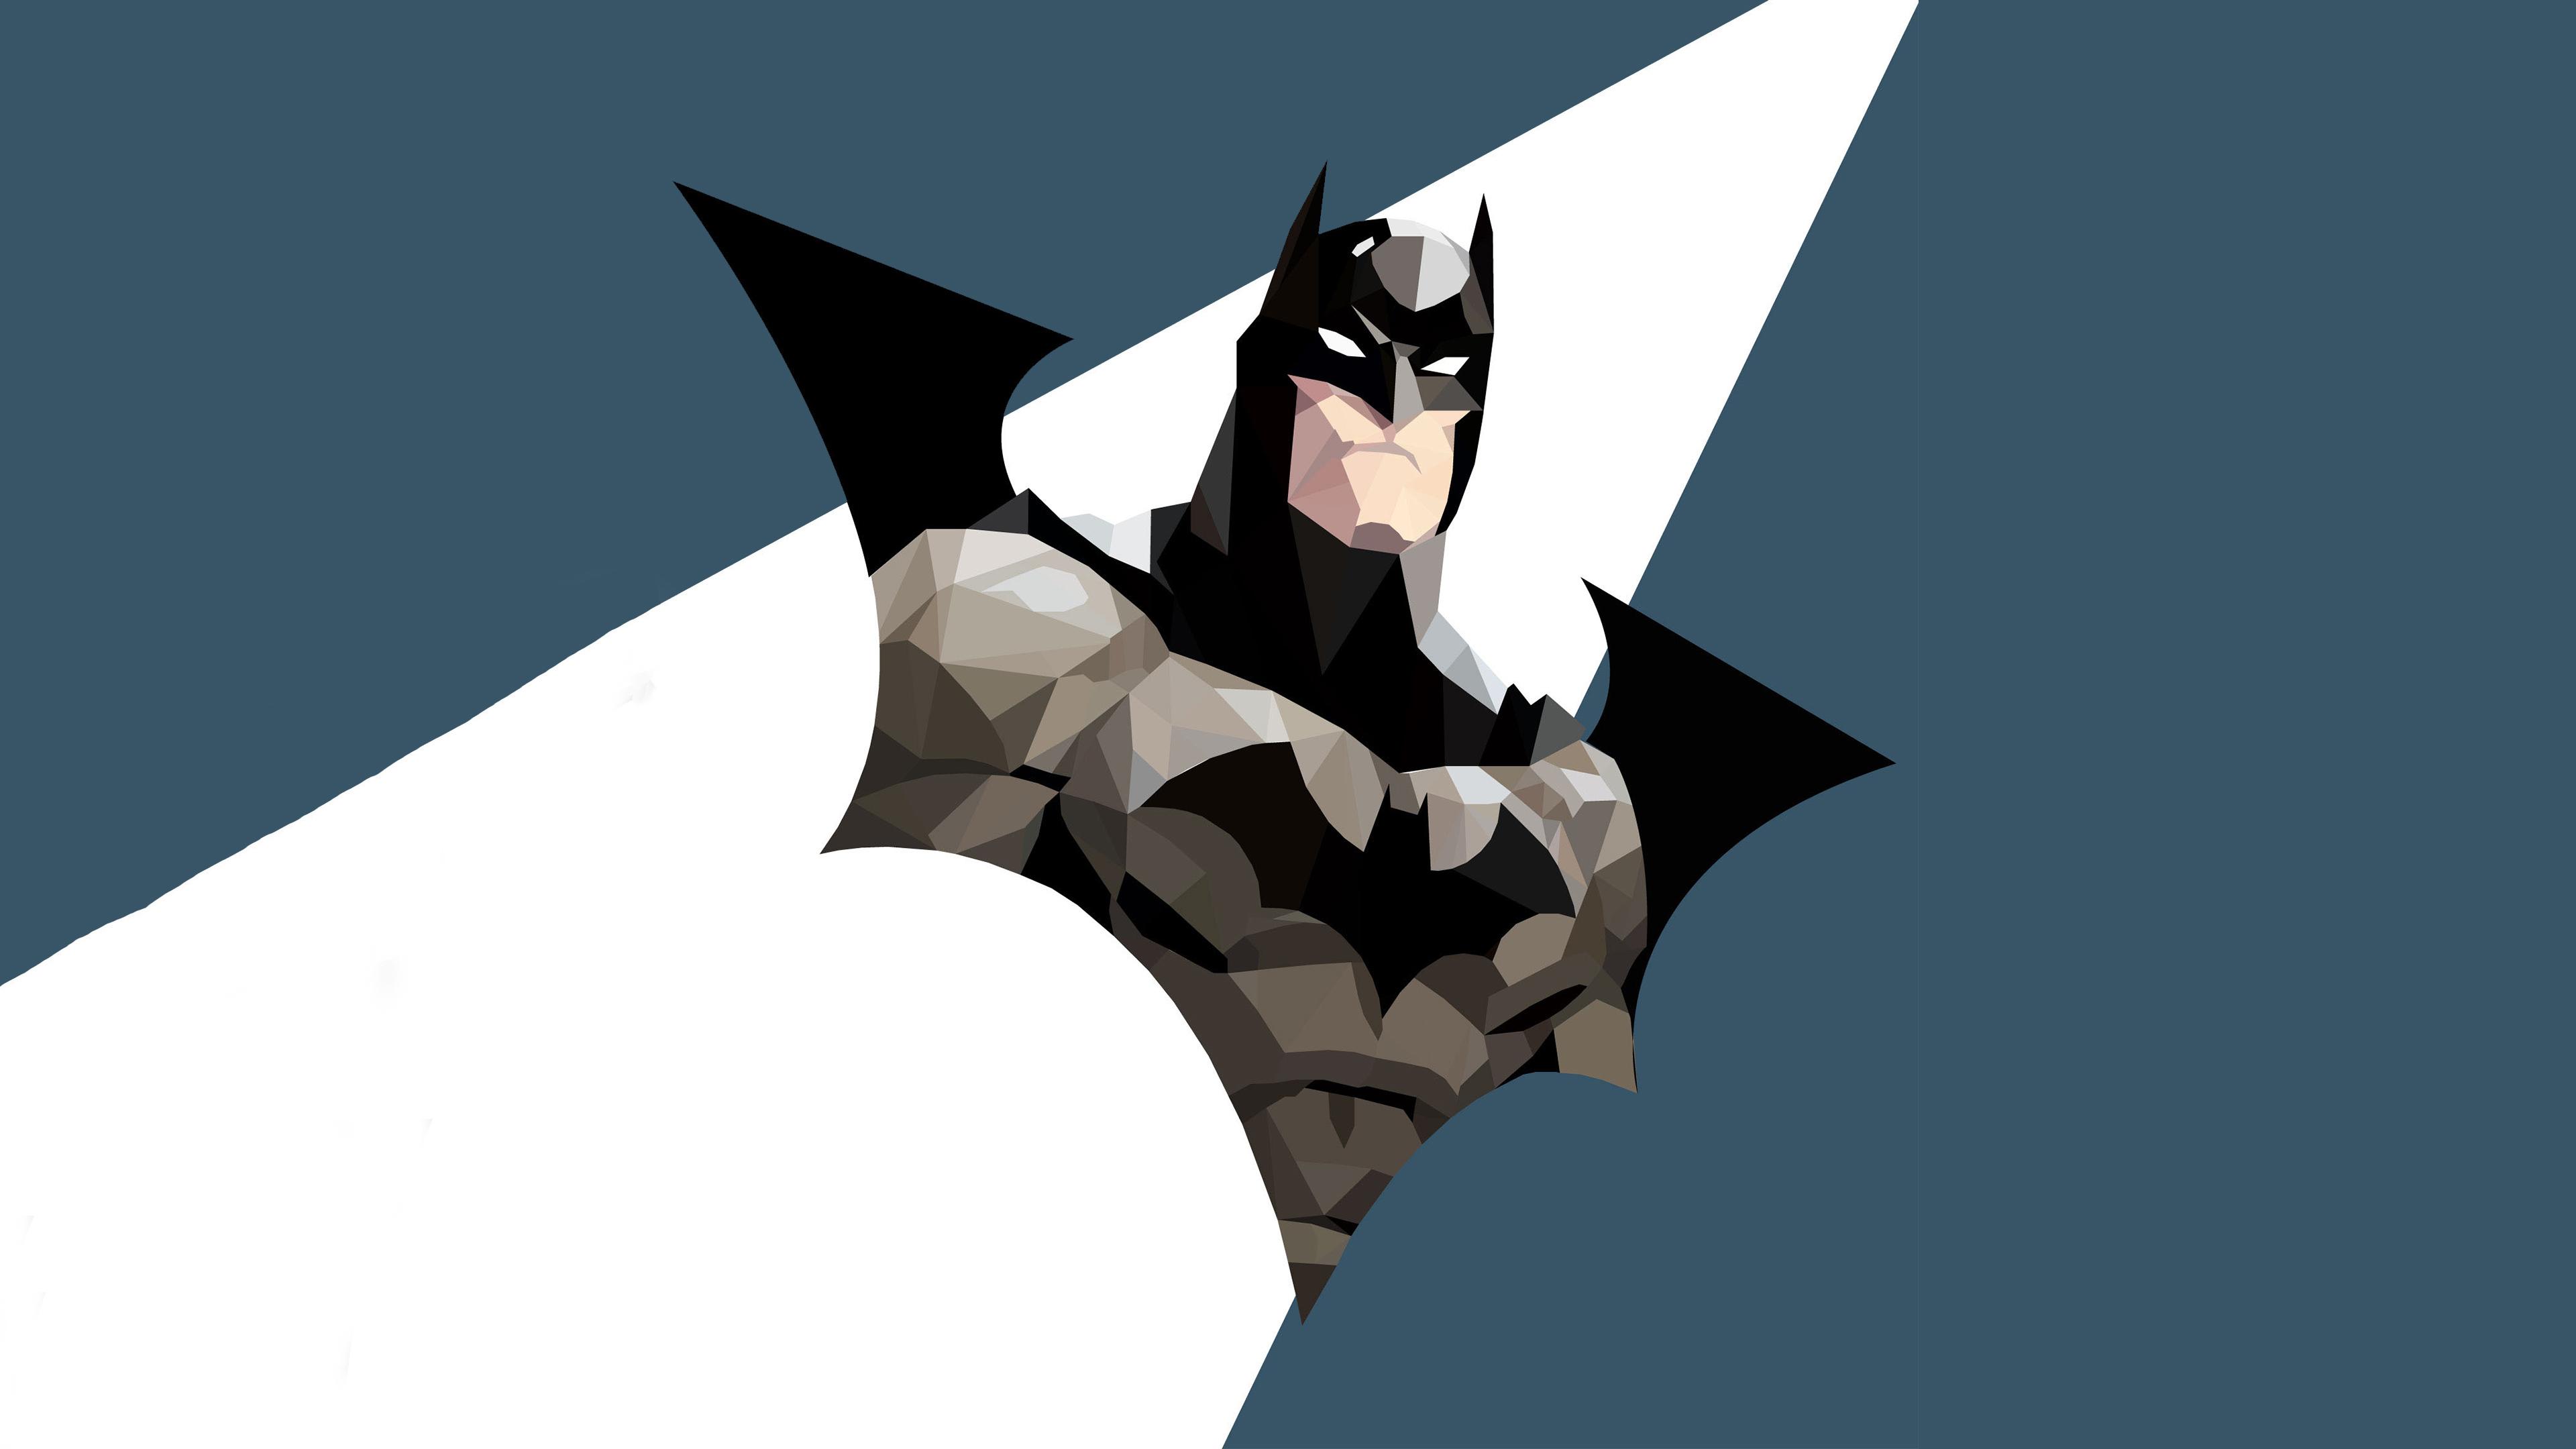 low poly art batman 4k 1553071269 - Low Poly Art Batman 4k - superheroes wallpapers, hd-wallpapers, behance wallpapers, batman wallpapers, artwork wallpapers, artist wallpapers, 4k-wallpapers